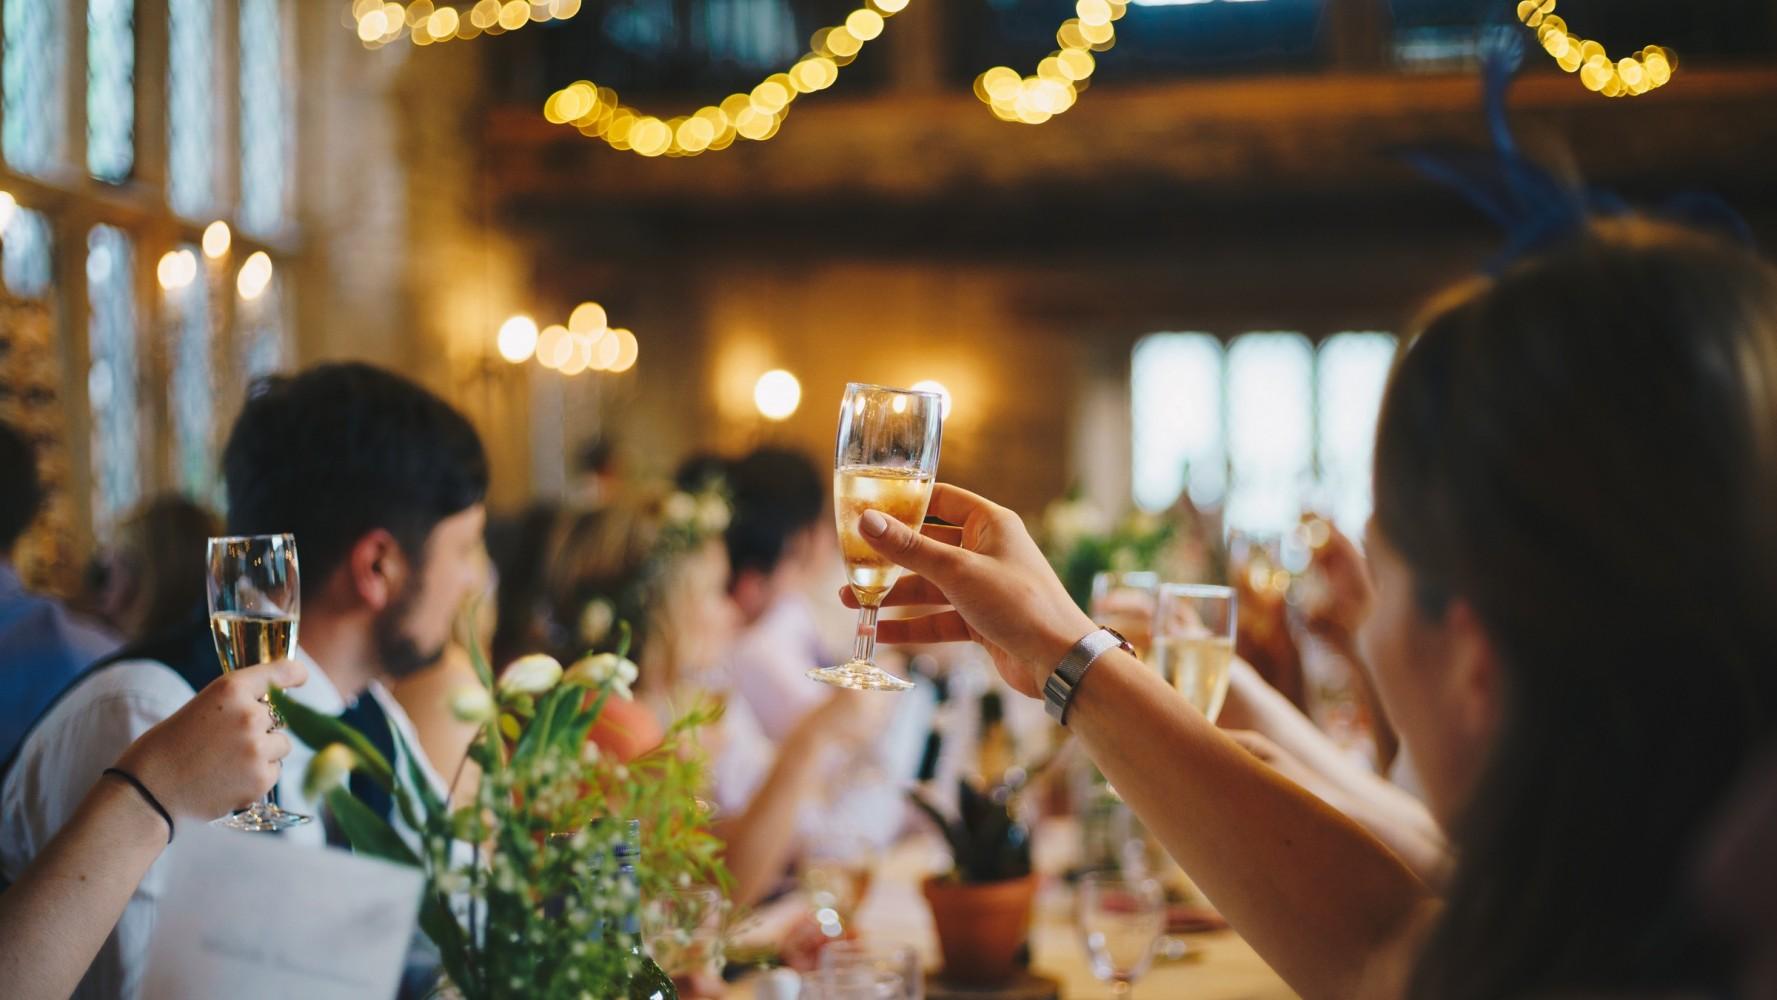 Čím si připít na svatbě